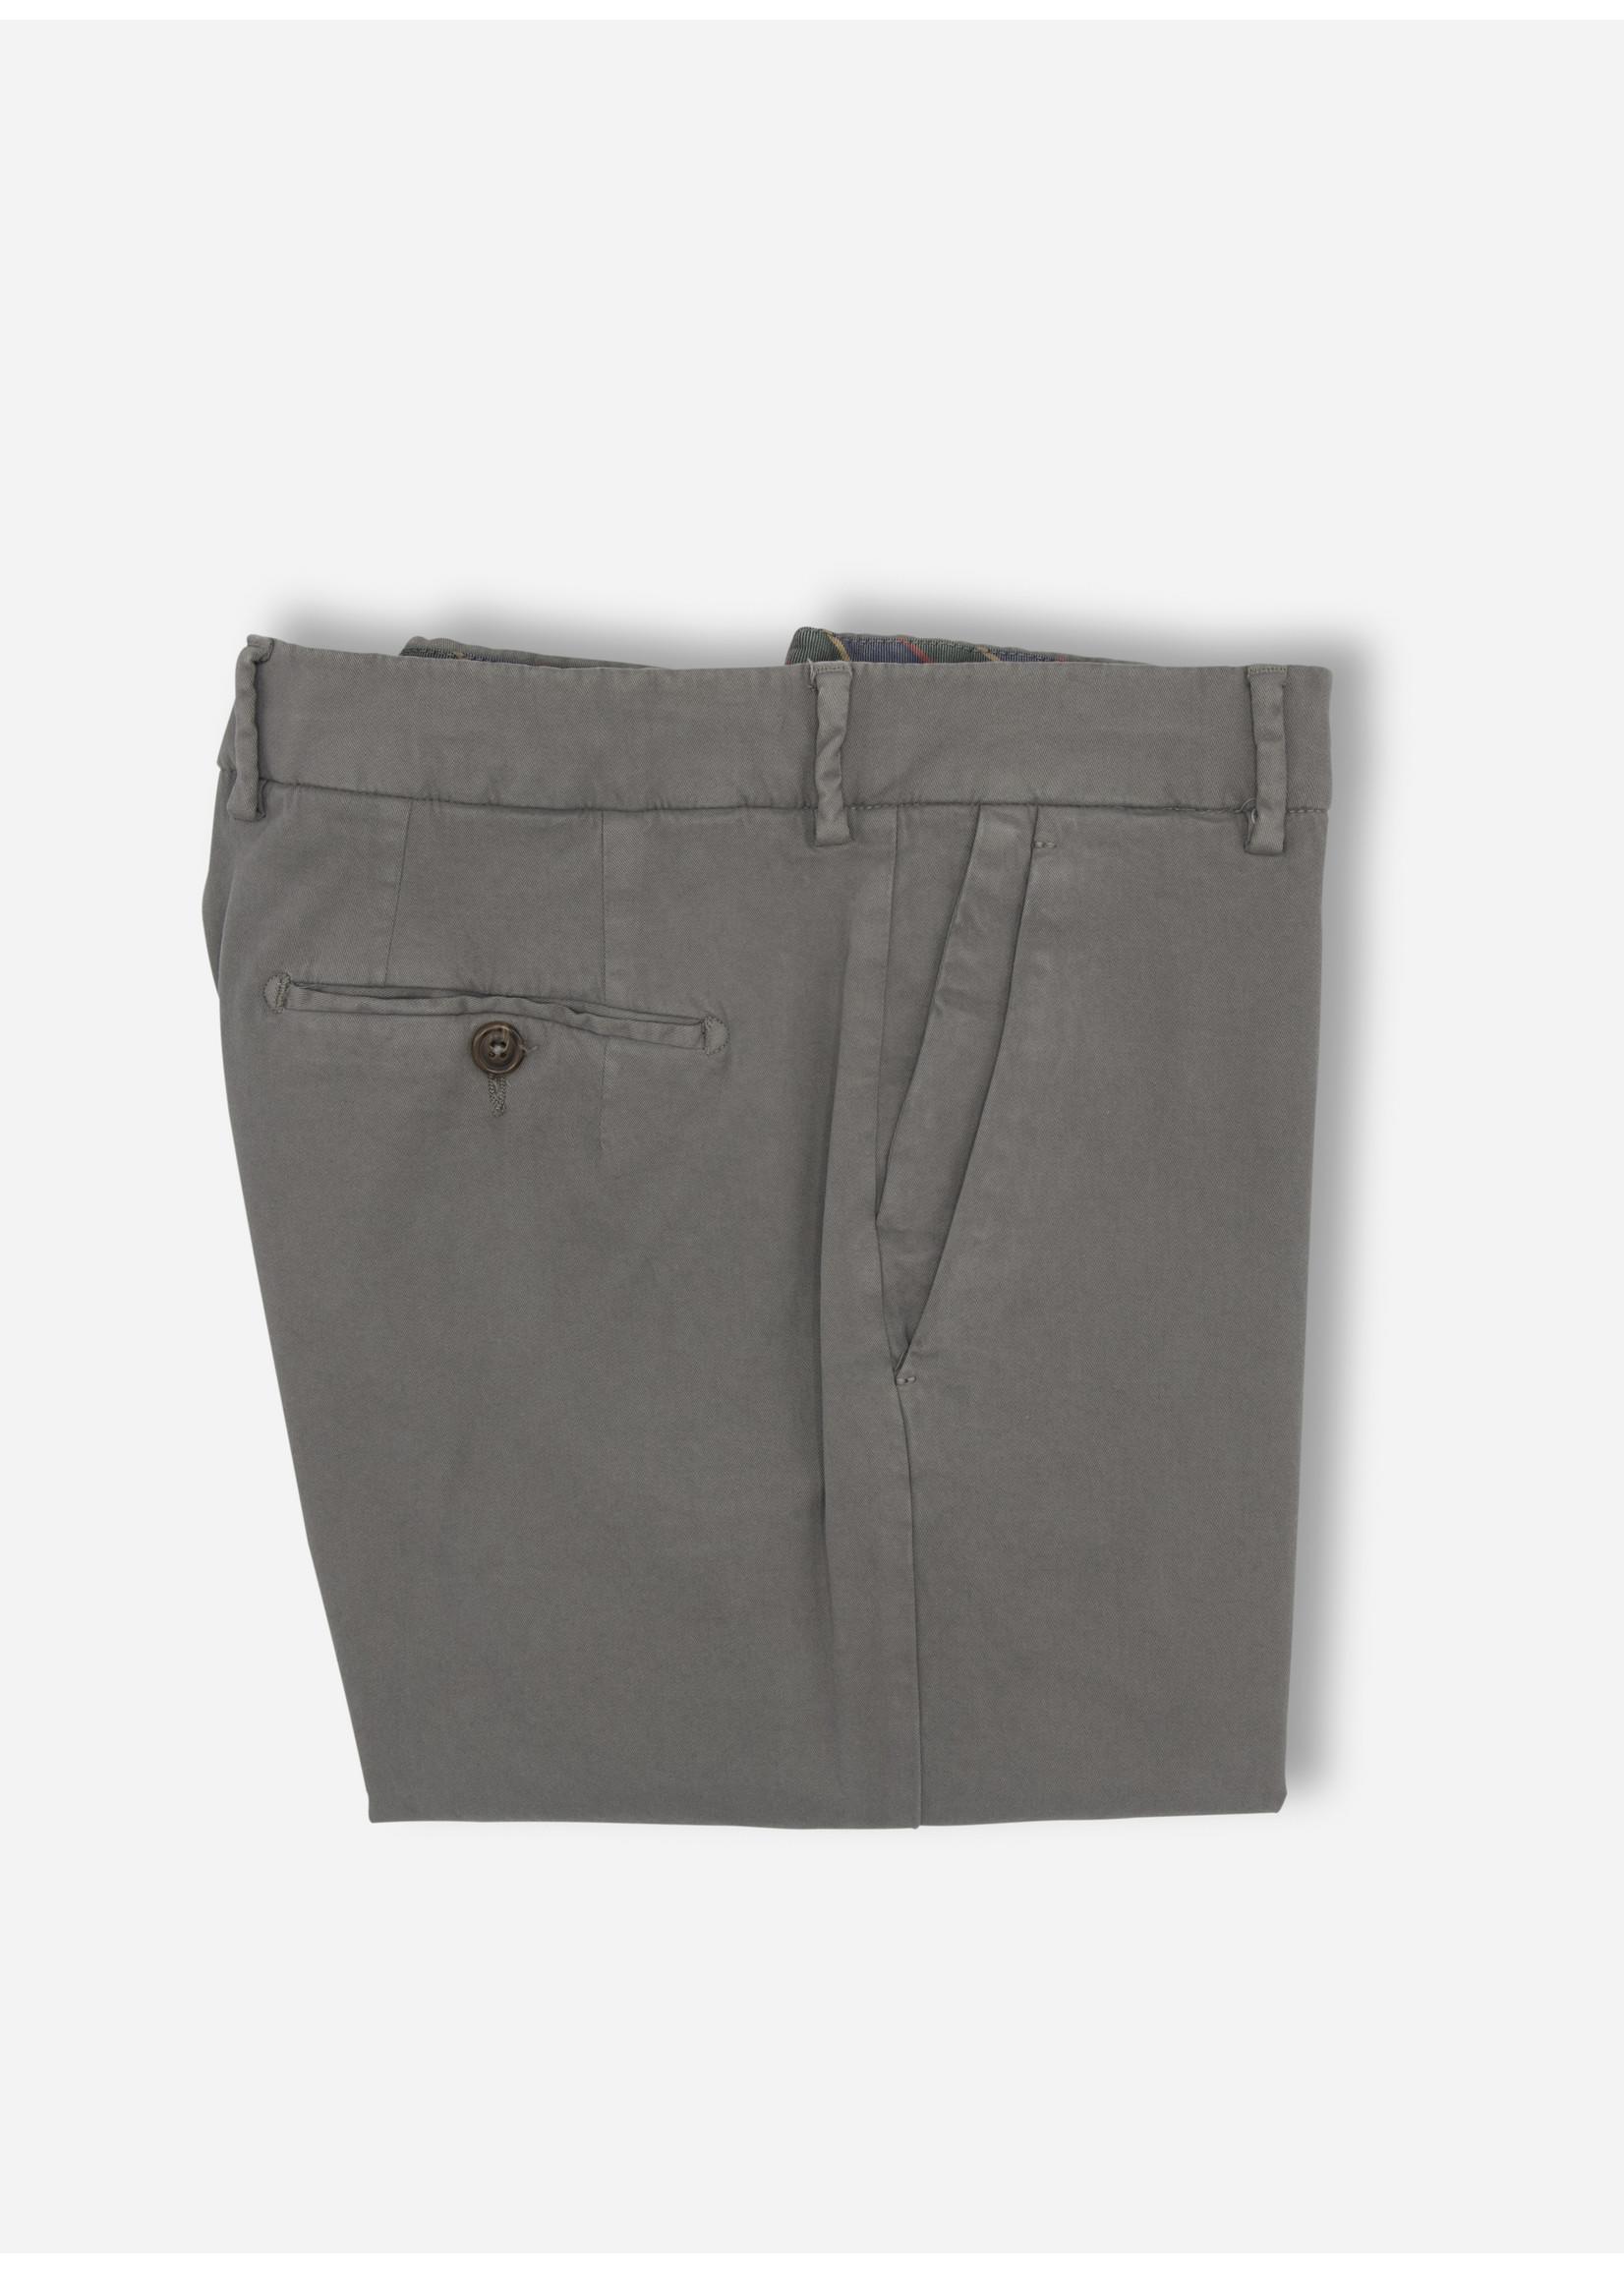 Ridiculous Classic Chino stretch grey cotton